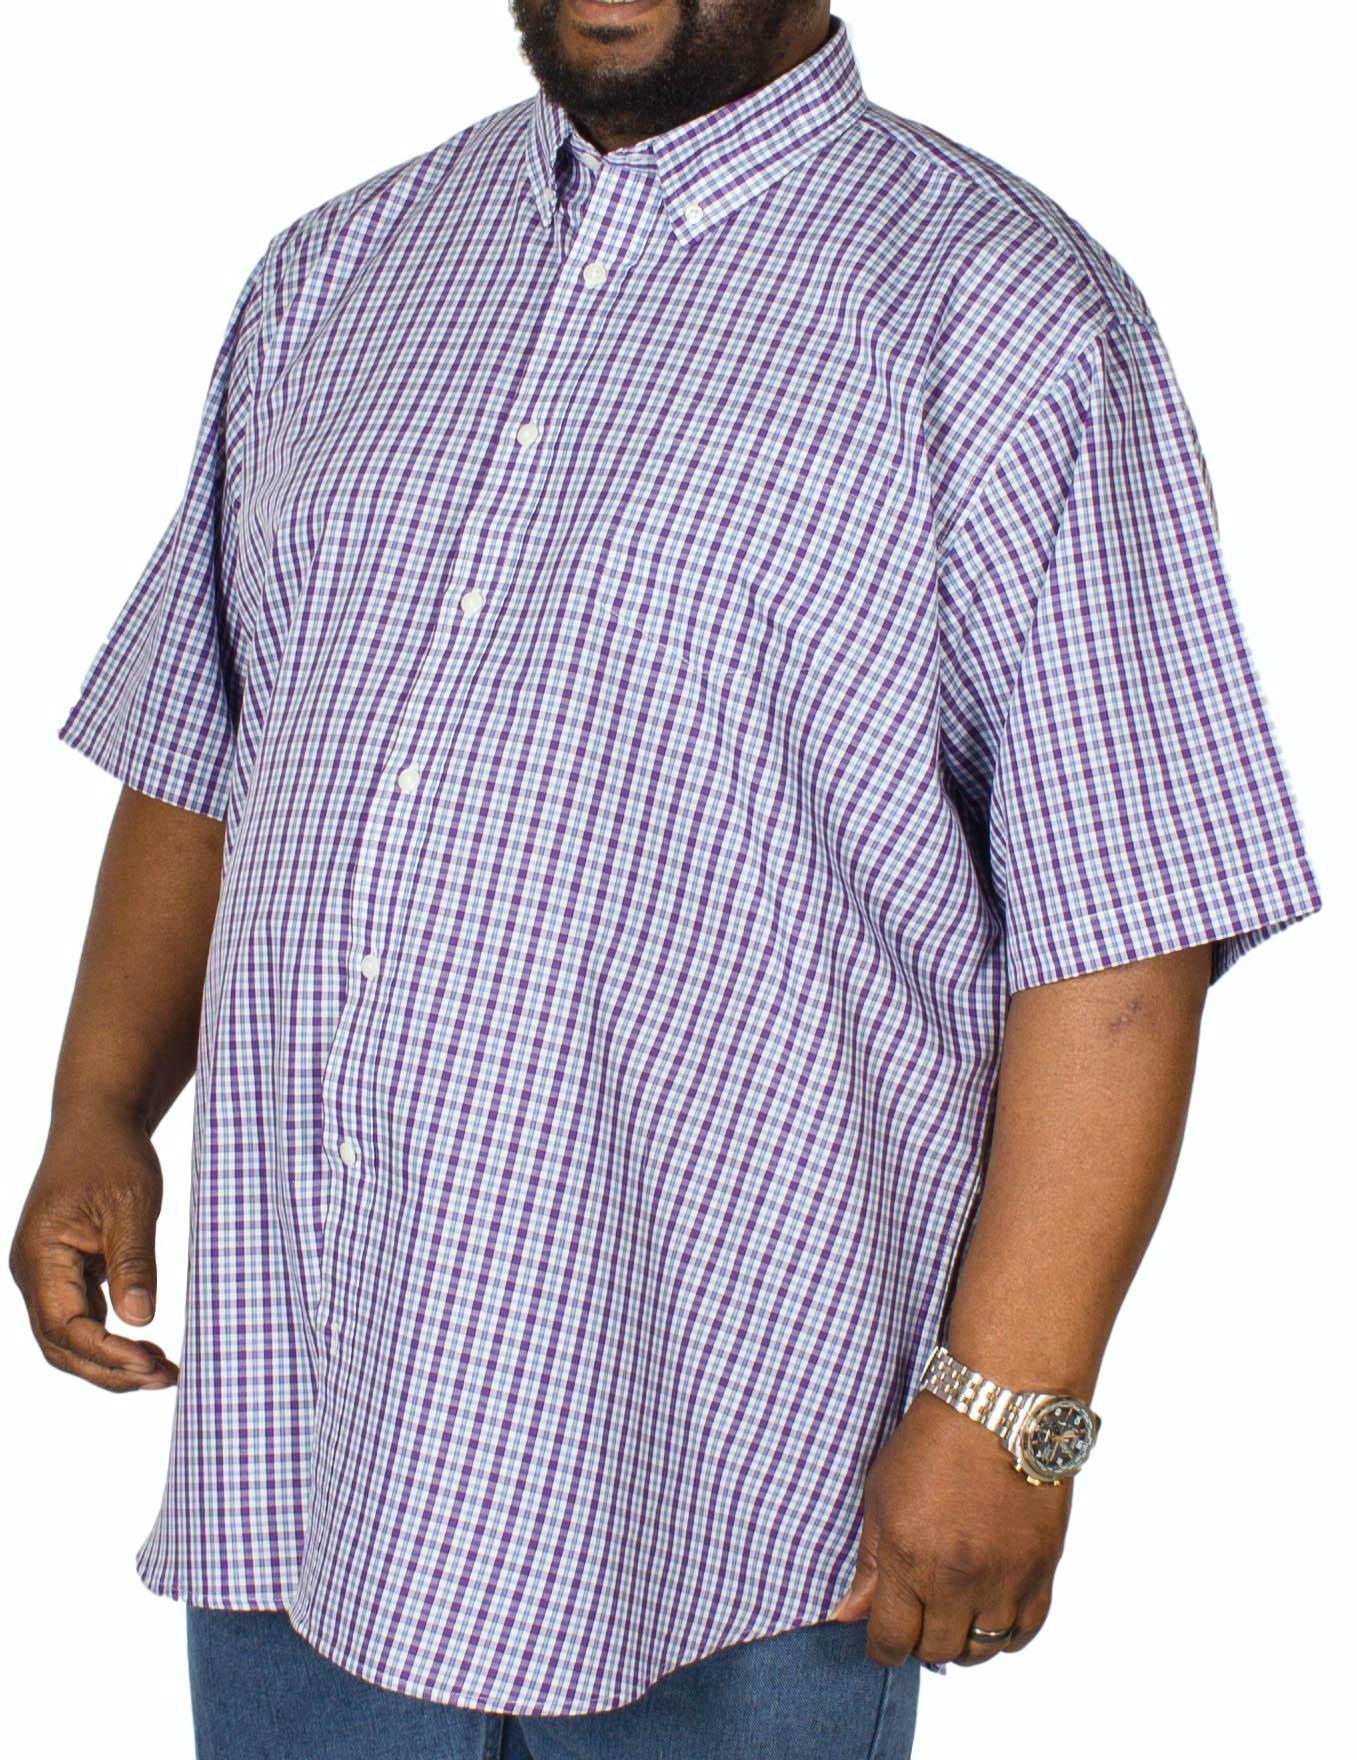 Carabou Check Short Sleeve Shirt Purple